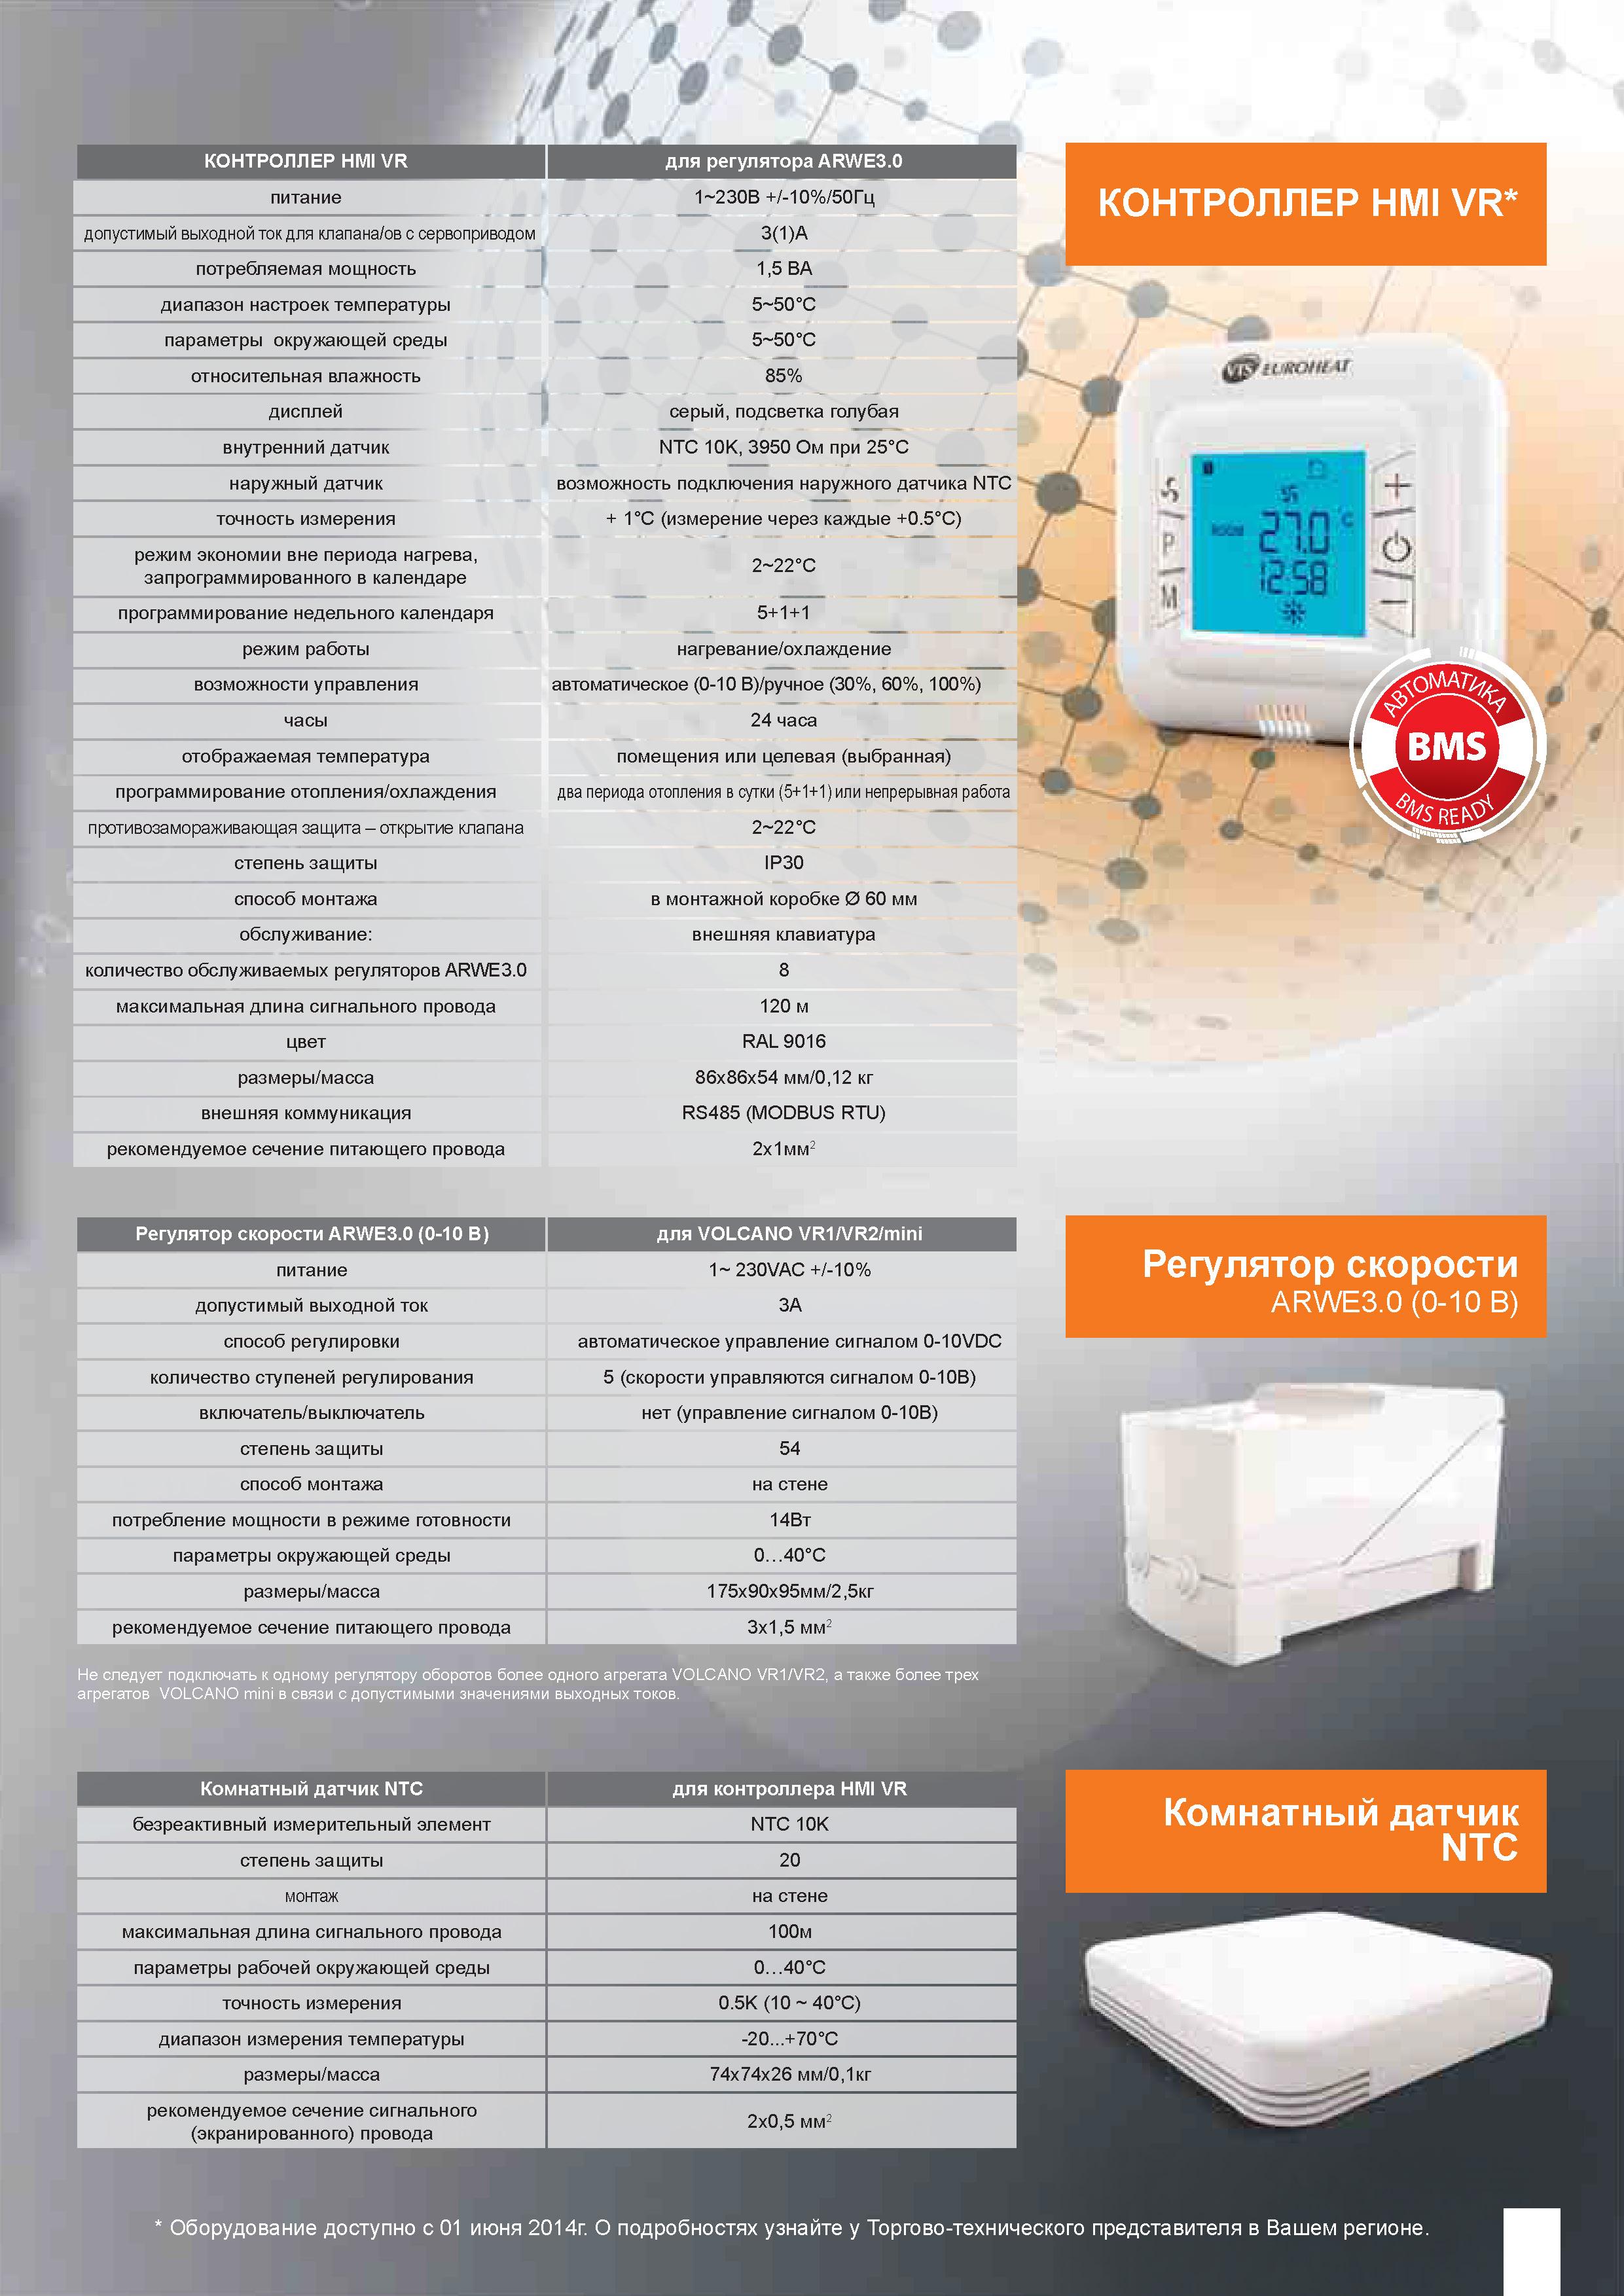 Контроллер HMI VR 0-10V характеристики